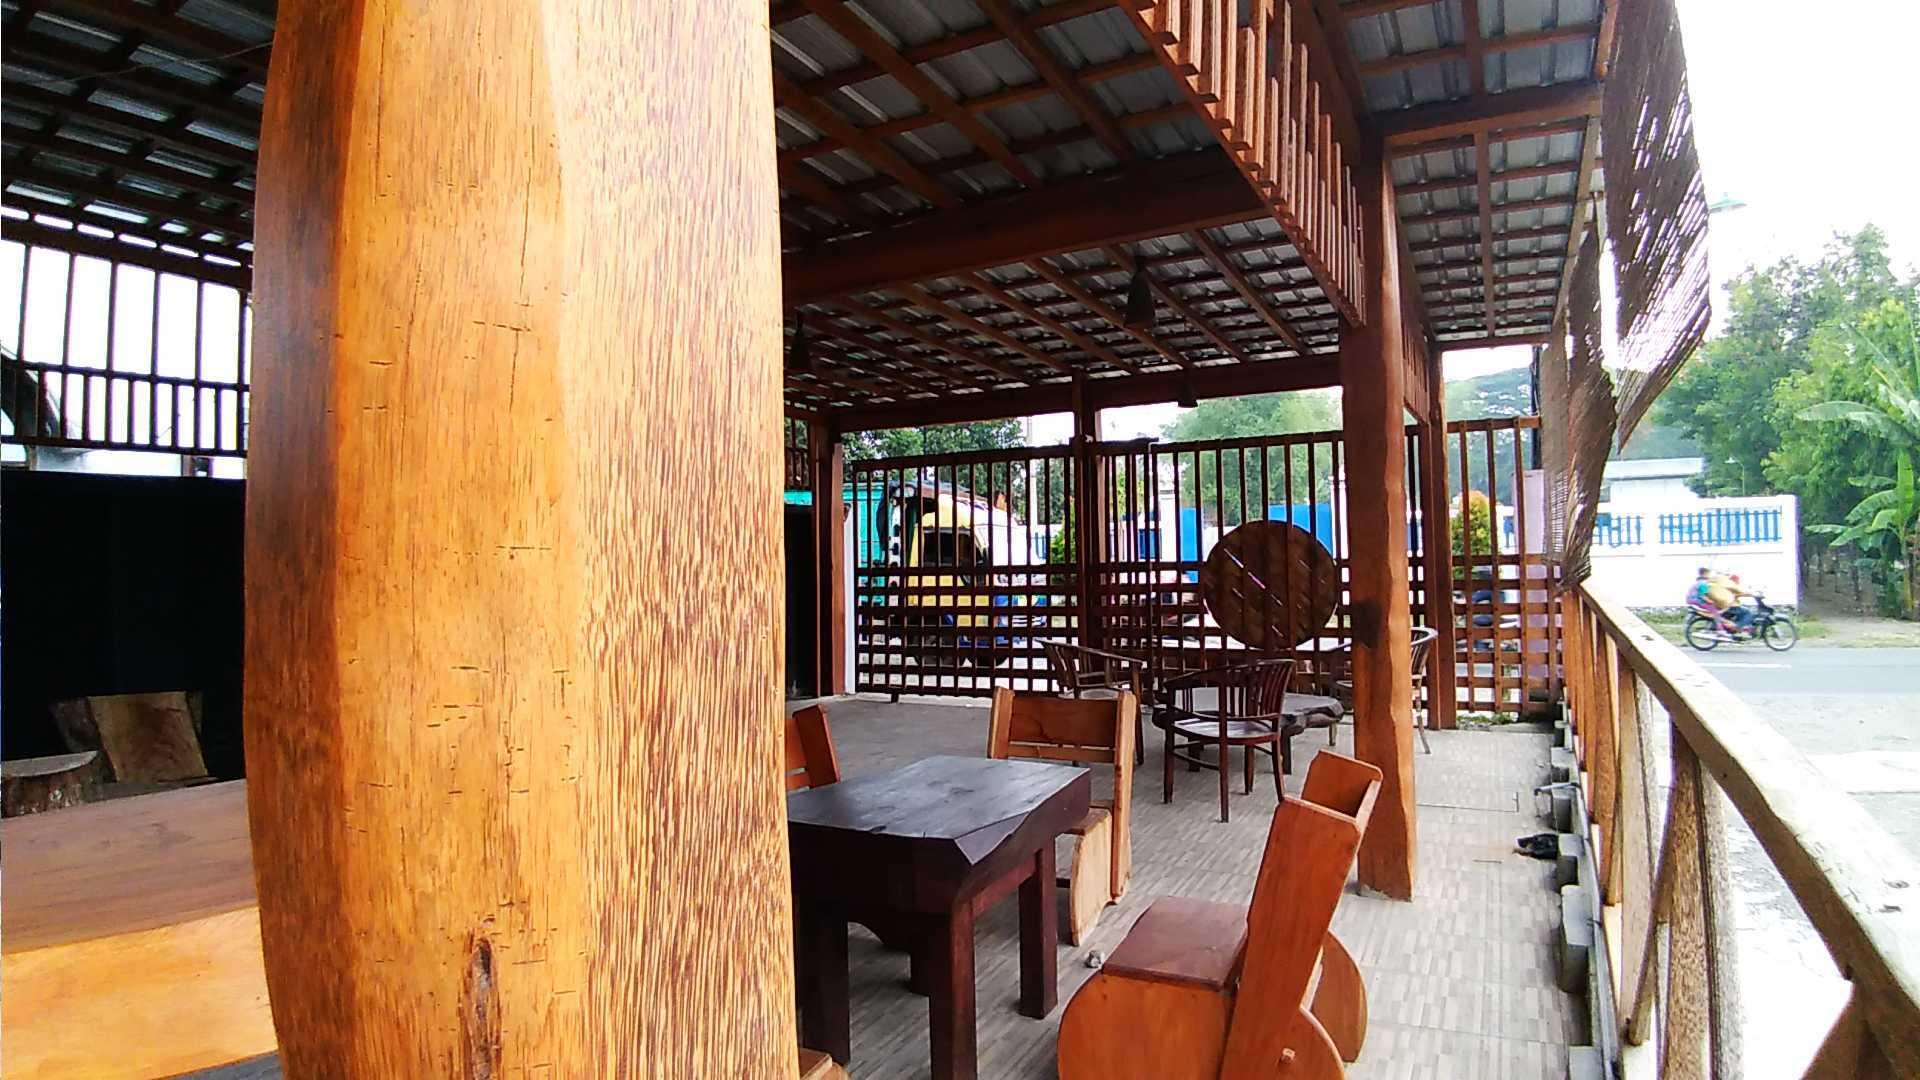 Epicnesia Architect Warung Mbok Ti Malang, Jawa Timur, Indonesia Kediri, Jawa Timur, Indonesia Aditya-Yuni-Prasetya-Bakso-Tiga-Berlian  64302